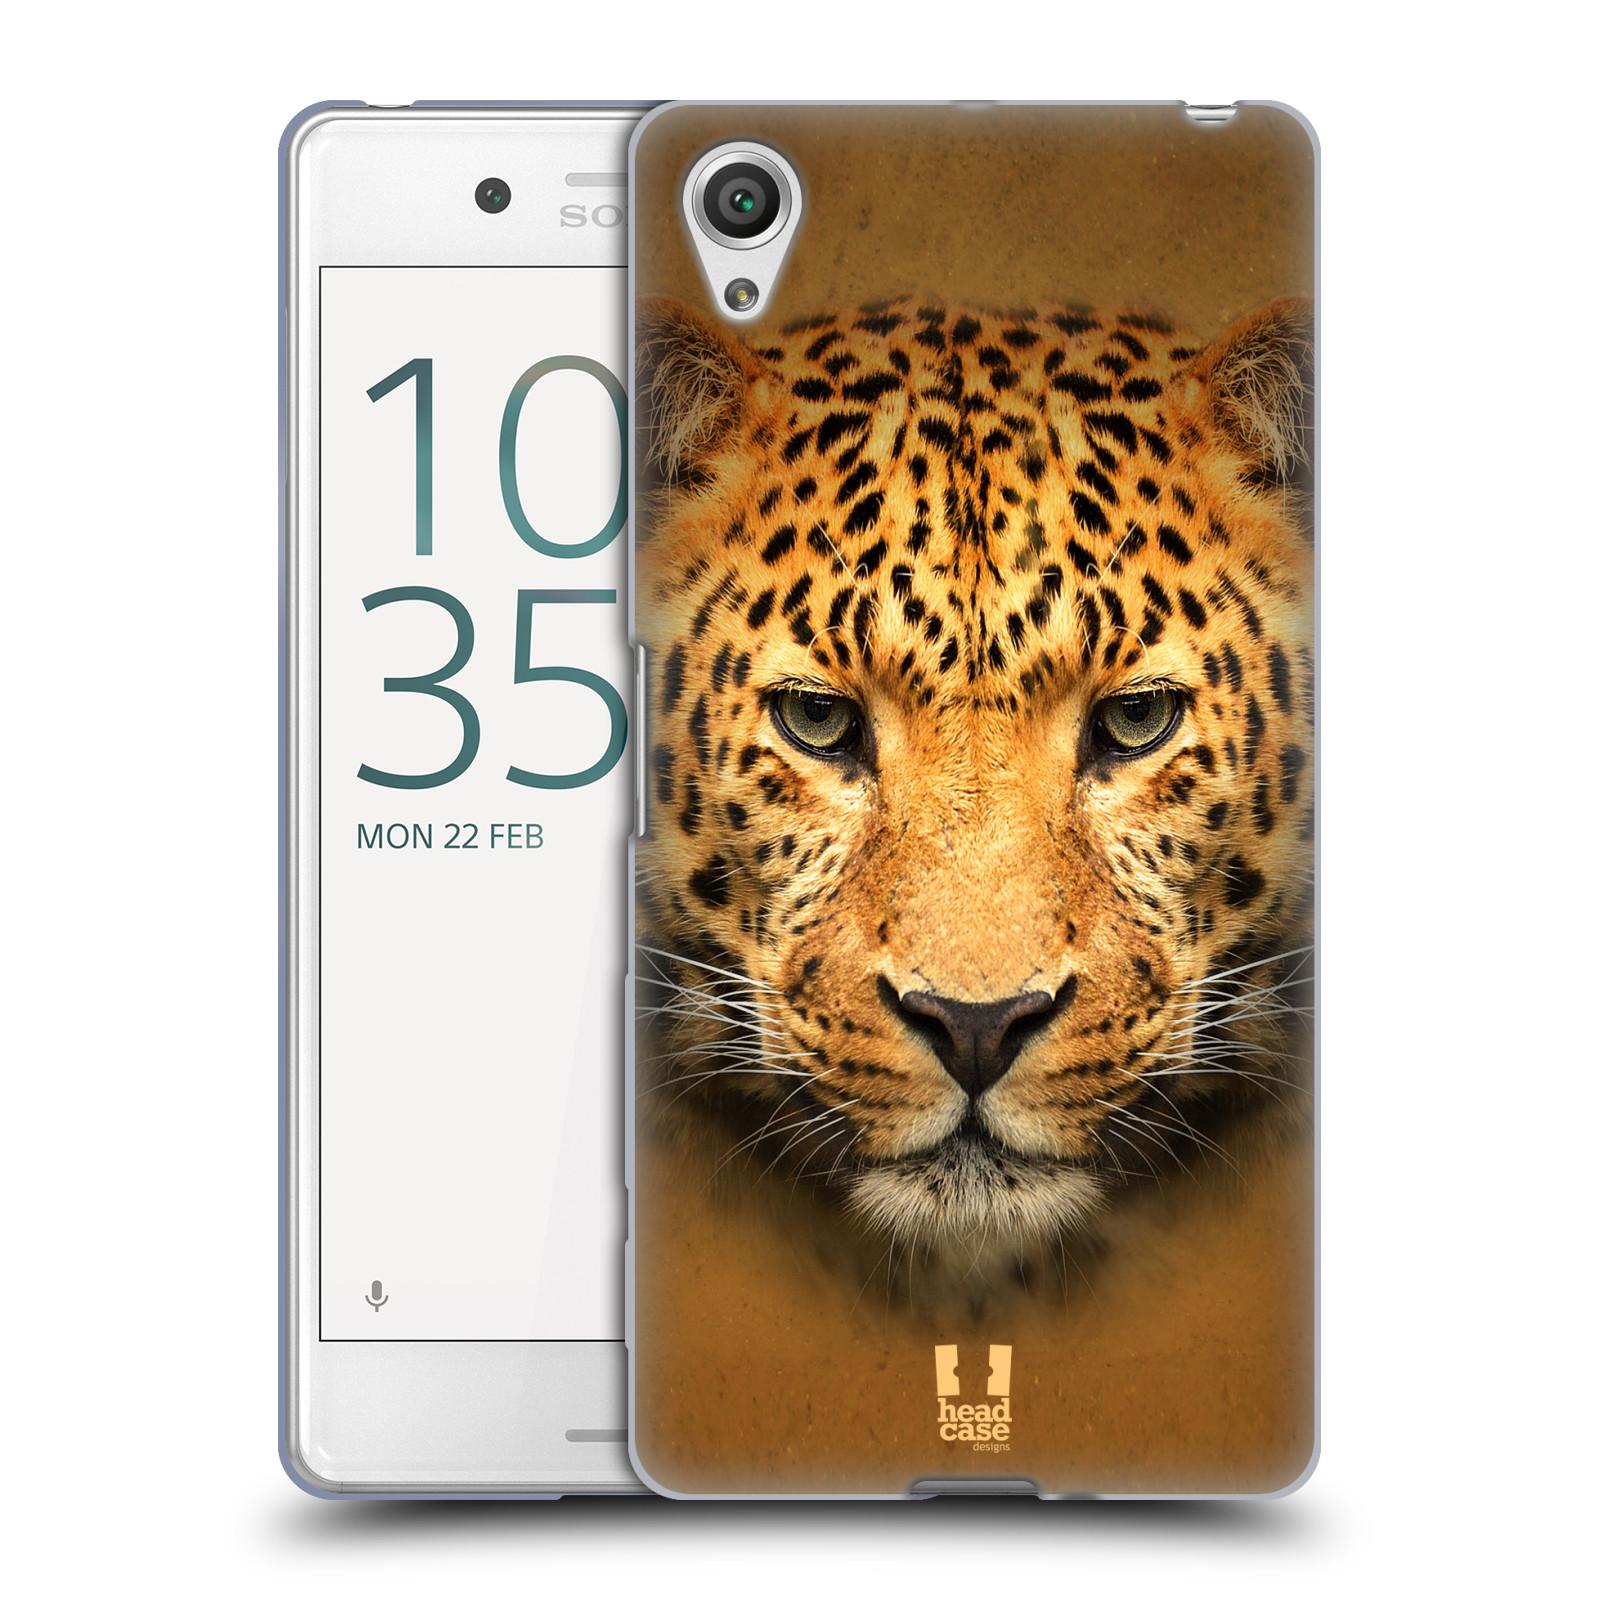 HEAD CASE silikonový obal na mobil Sony Xperia X PERFORMANCE (F8131, F8132) vzor Zvířecí tváře 2 leopard